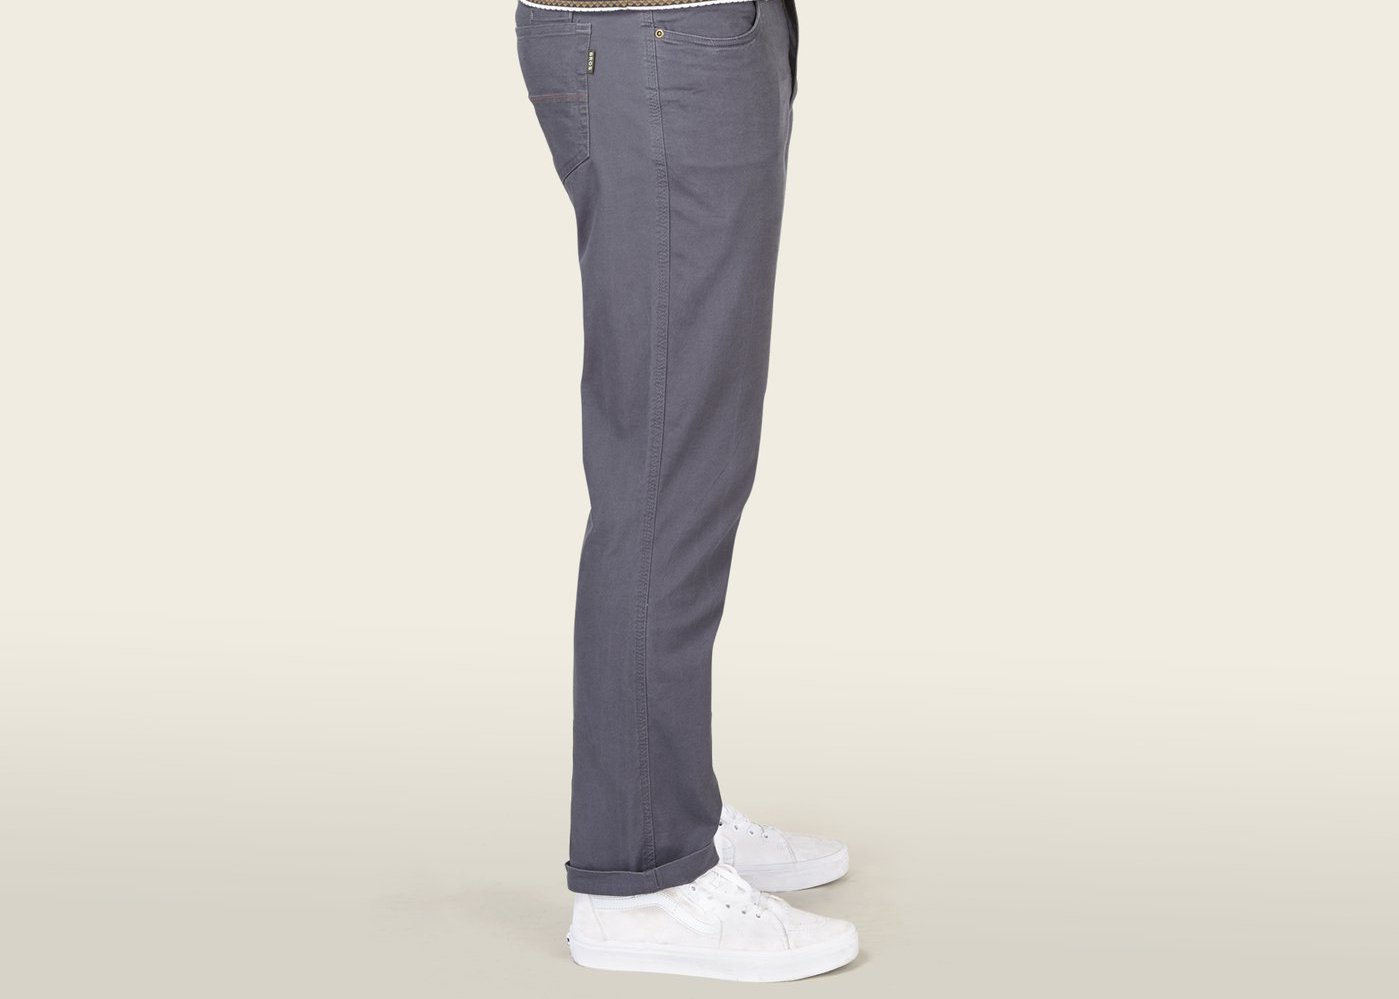 Howler Bros Frontside pants